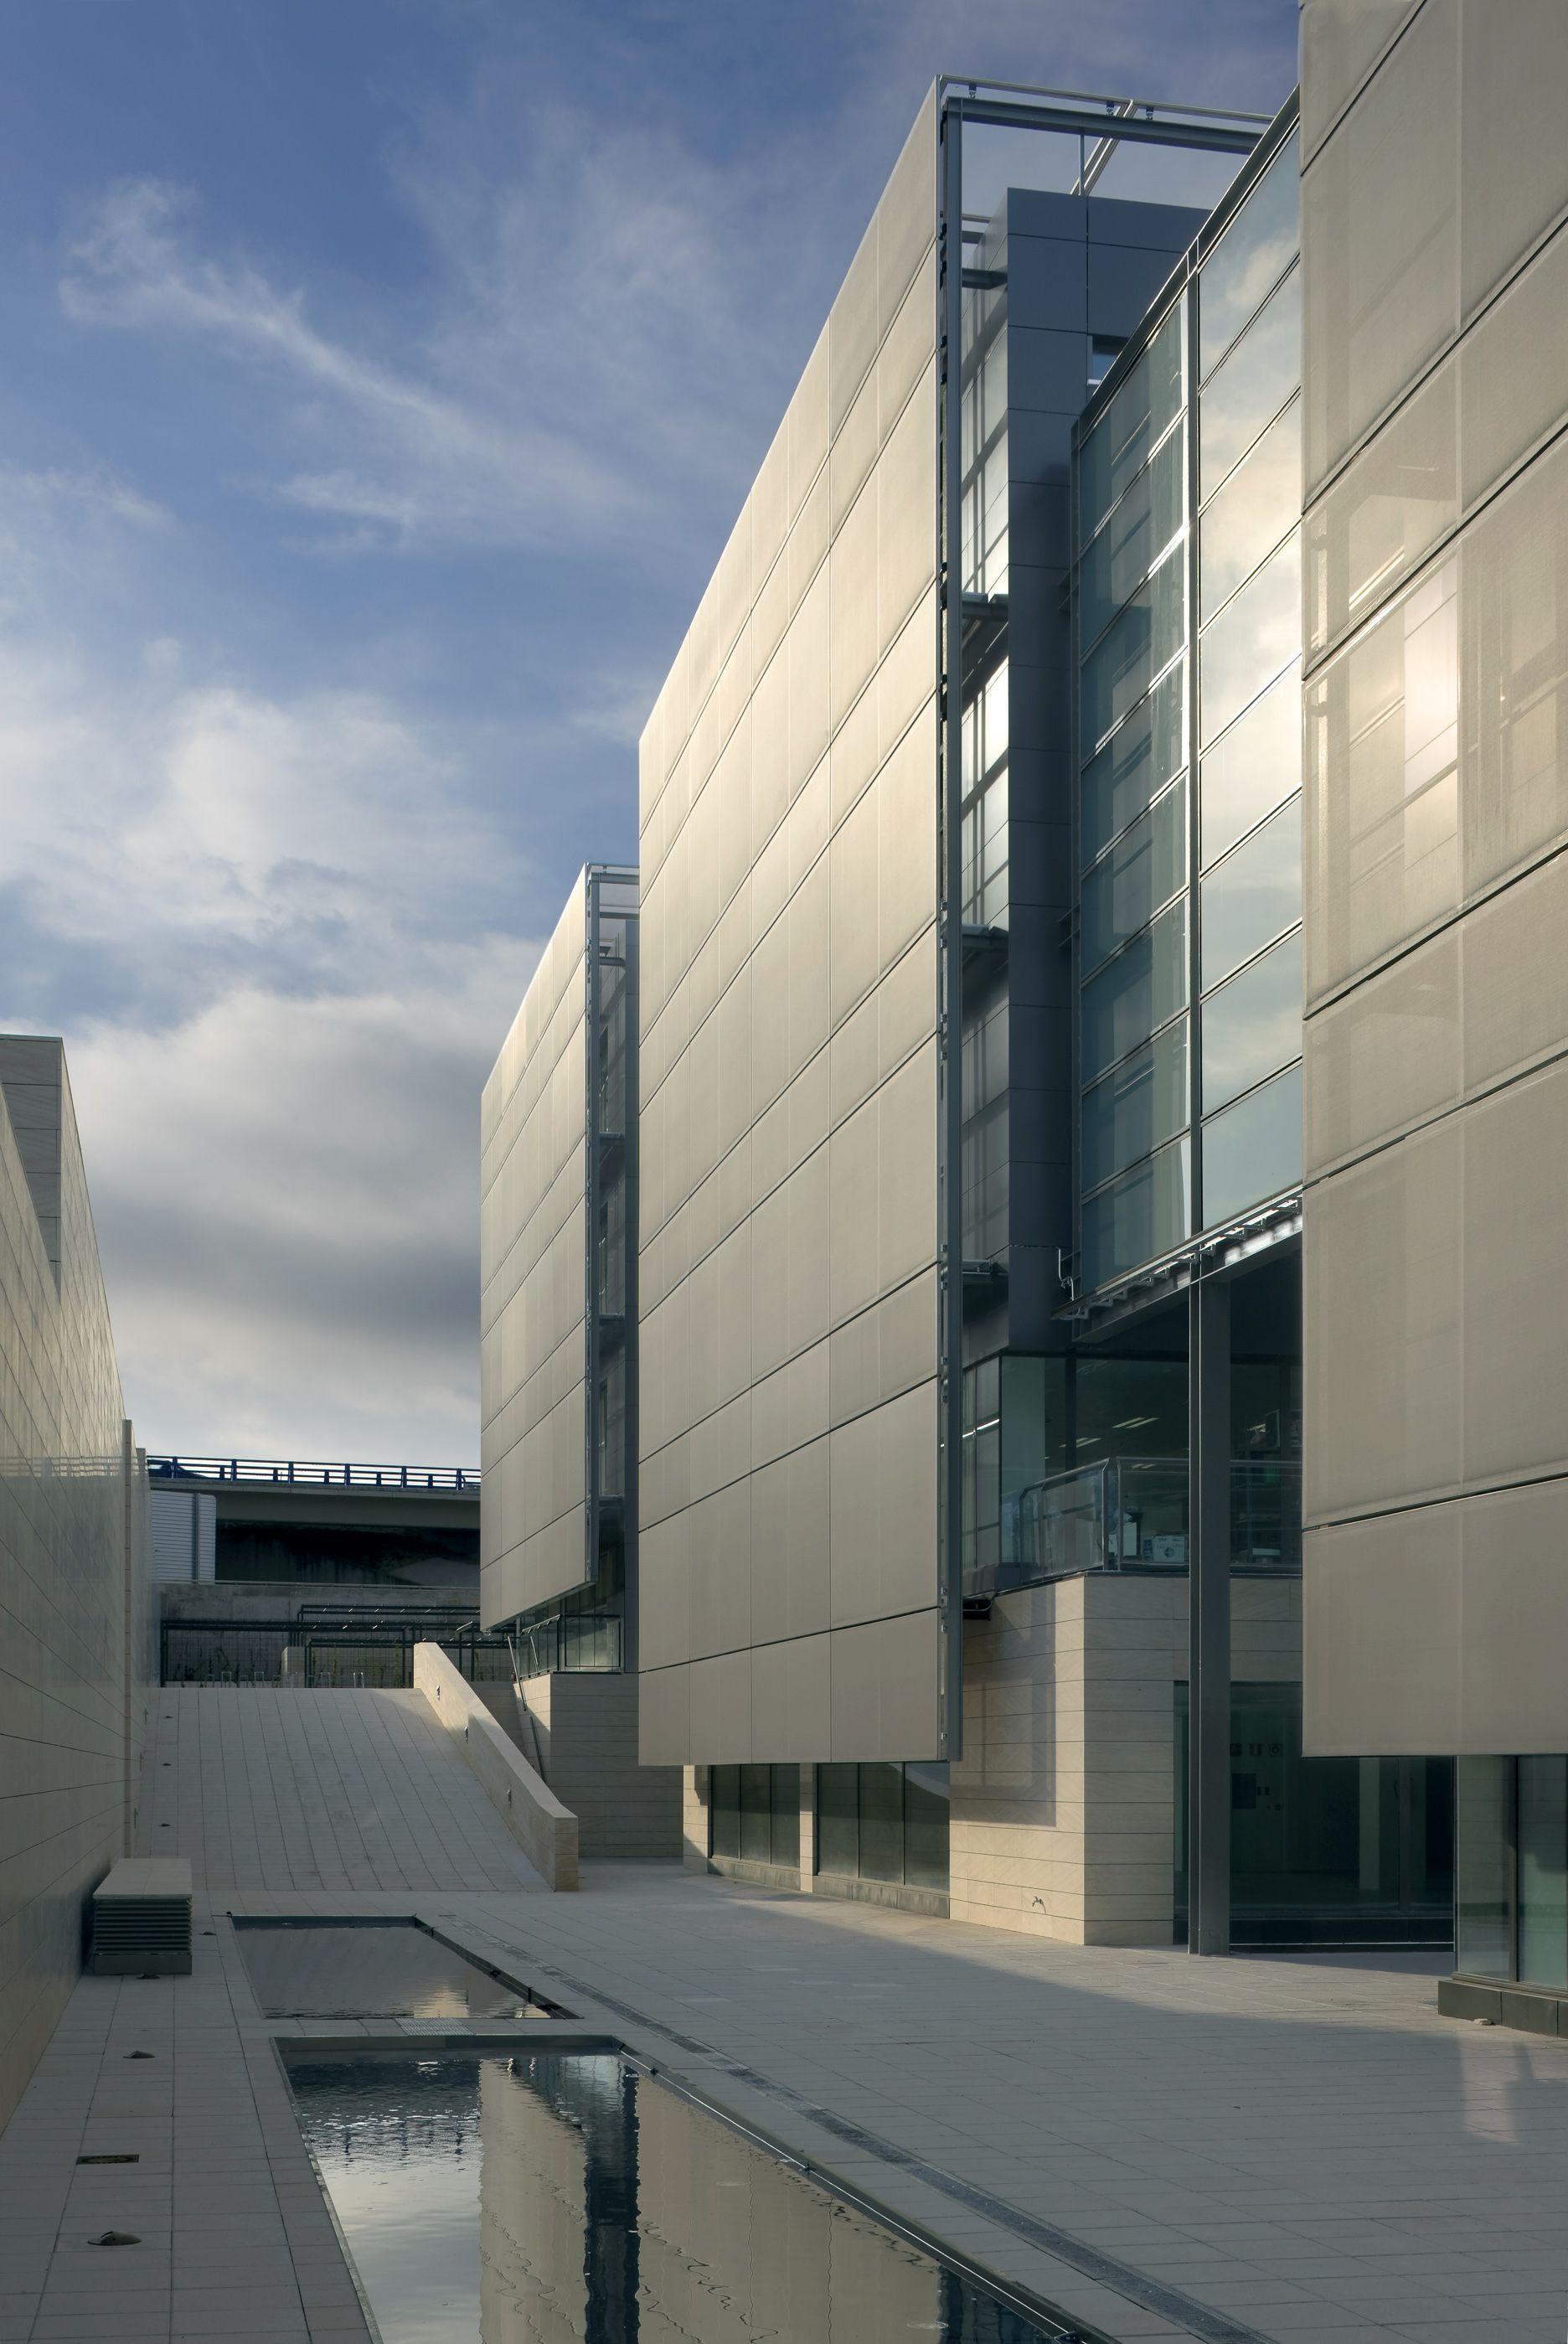 Tripark las rozas allende arquitectos madrid 2009 leed gold core shell office pinterest - Arquitectos interioristas madrid ...